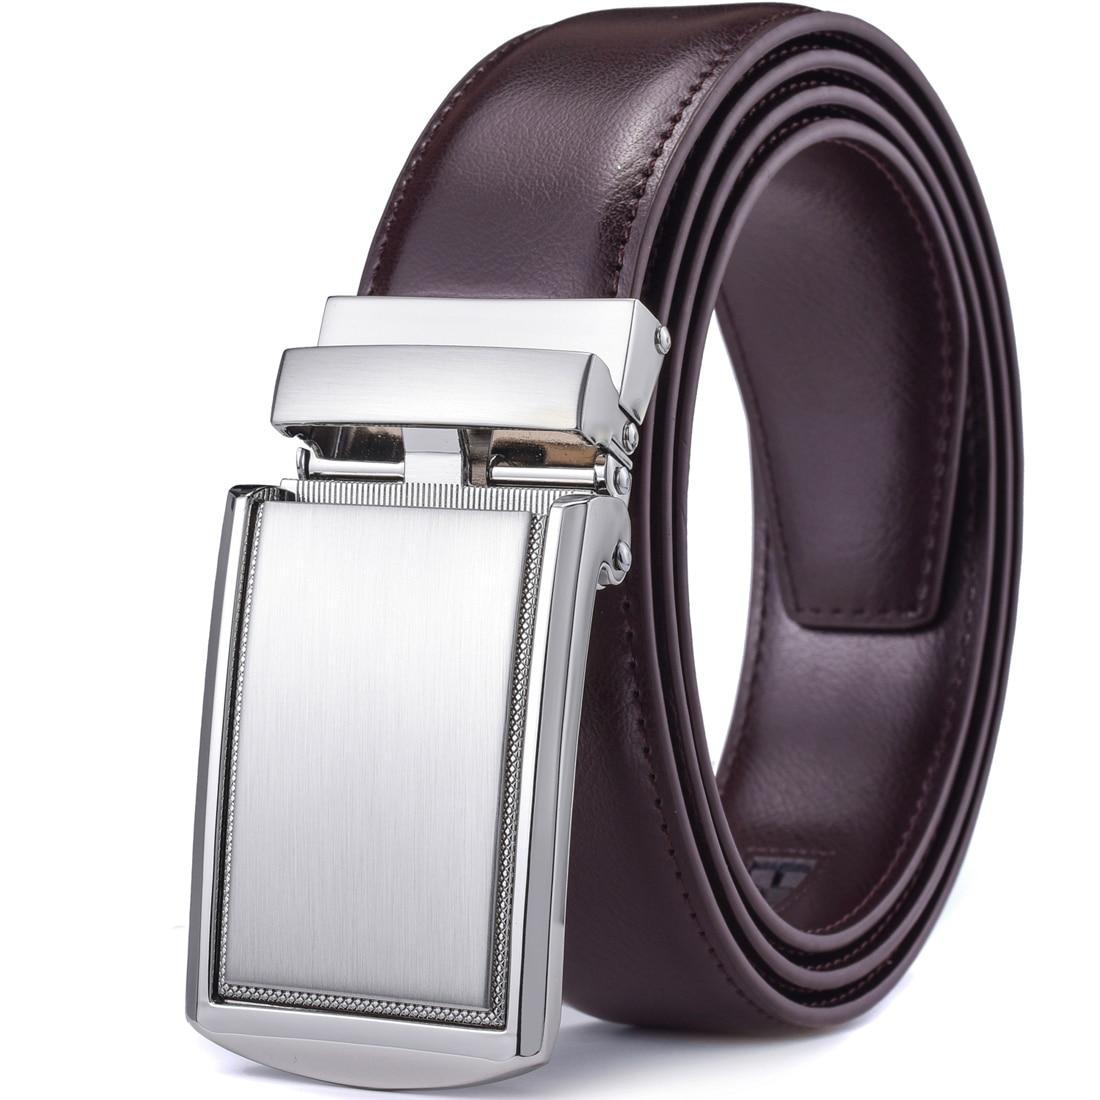 AliExpress - Men's Leather Ratchet Belt with Automatic Buckle 1 3/8 Wide Adjustable Dress